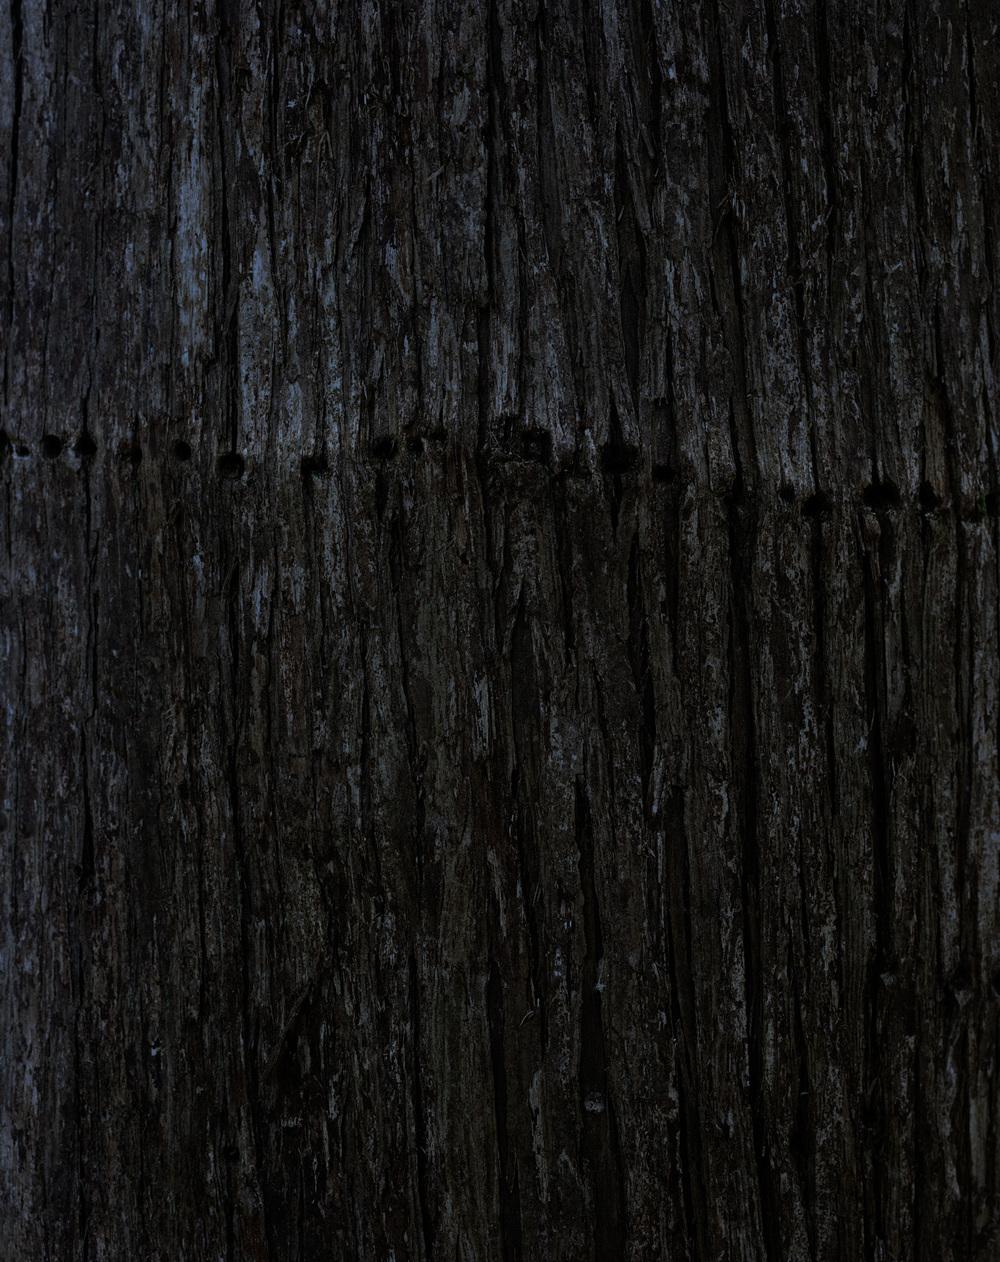 bark 10 015.jpg